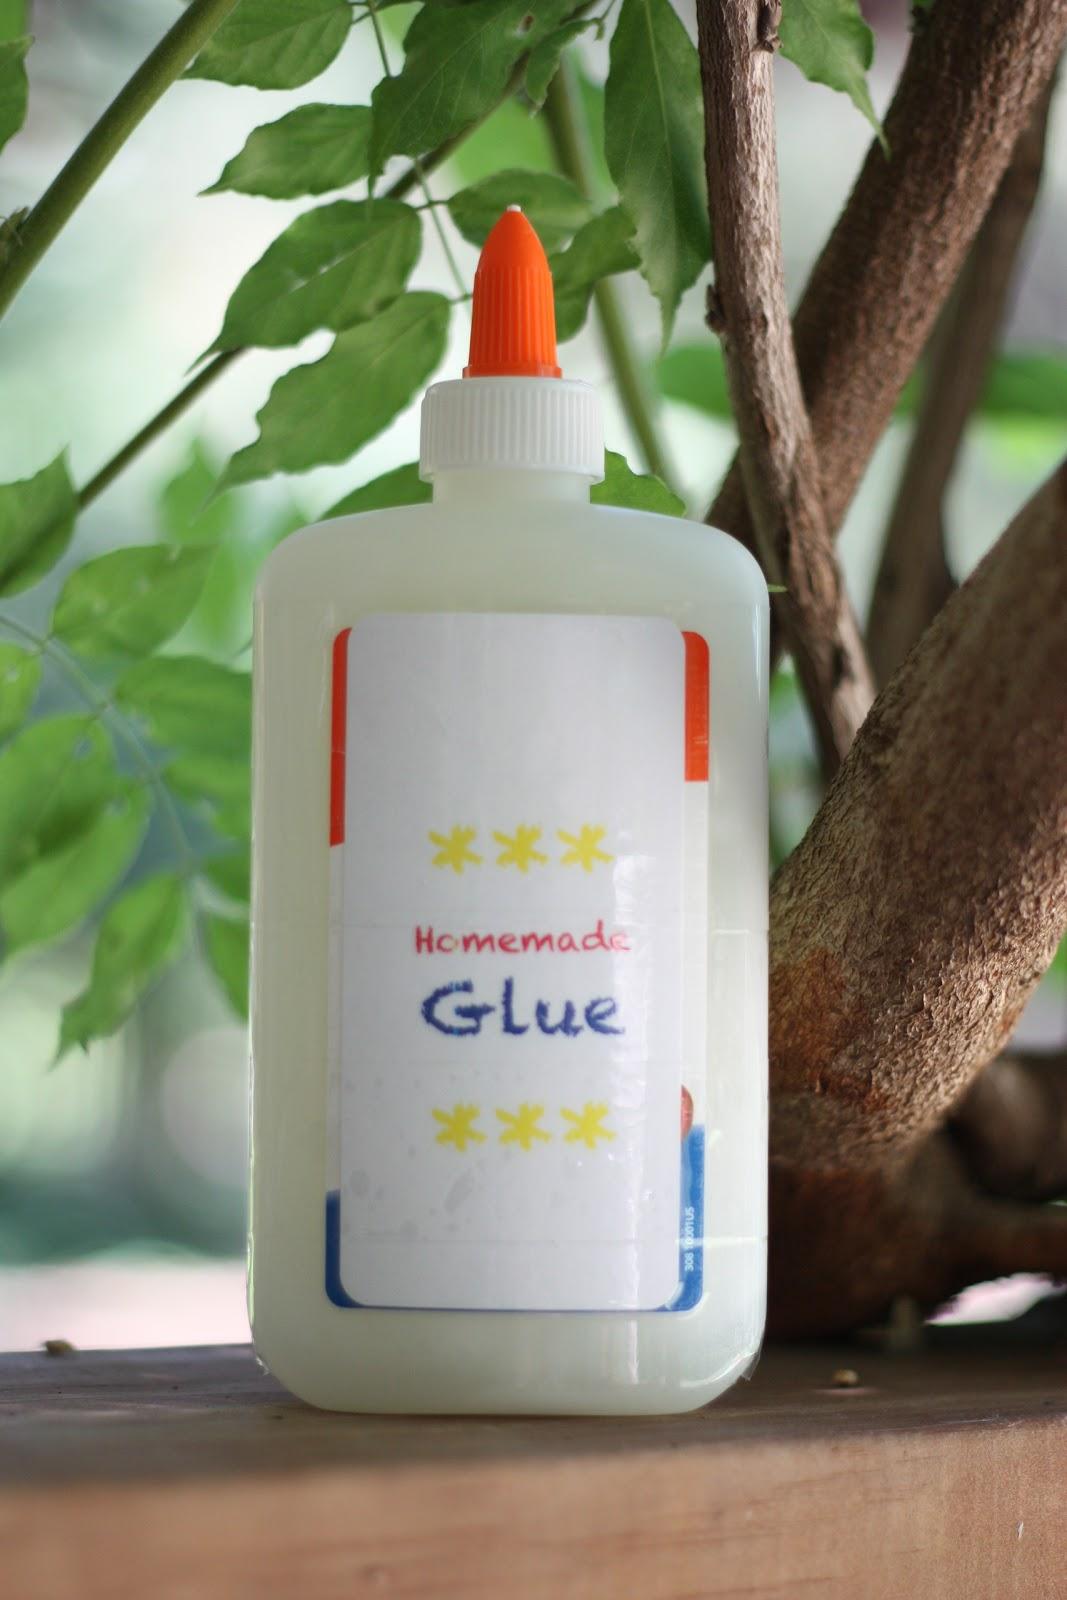 Easy Homemade Glue Recipe For Kids